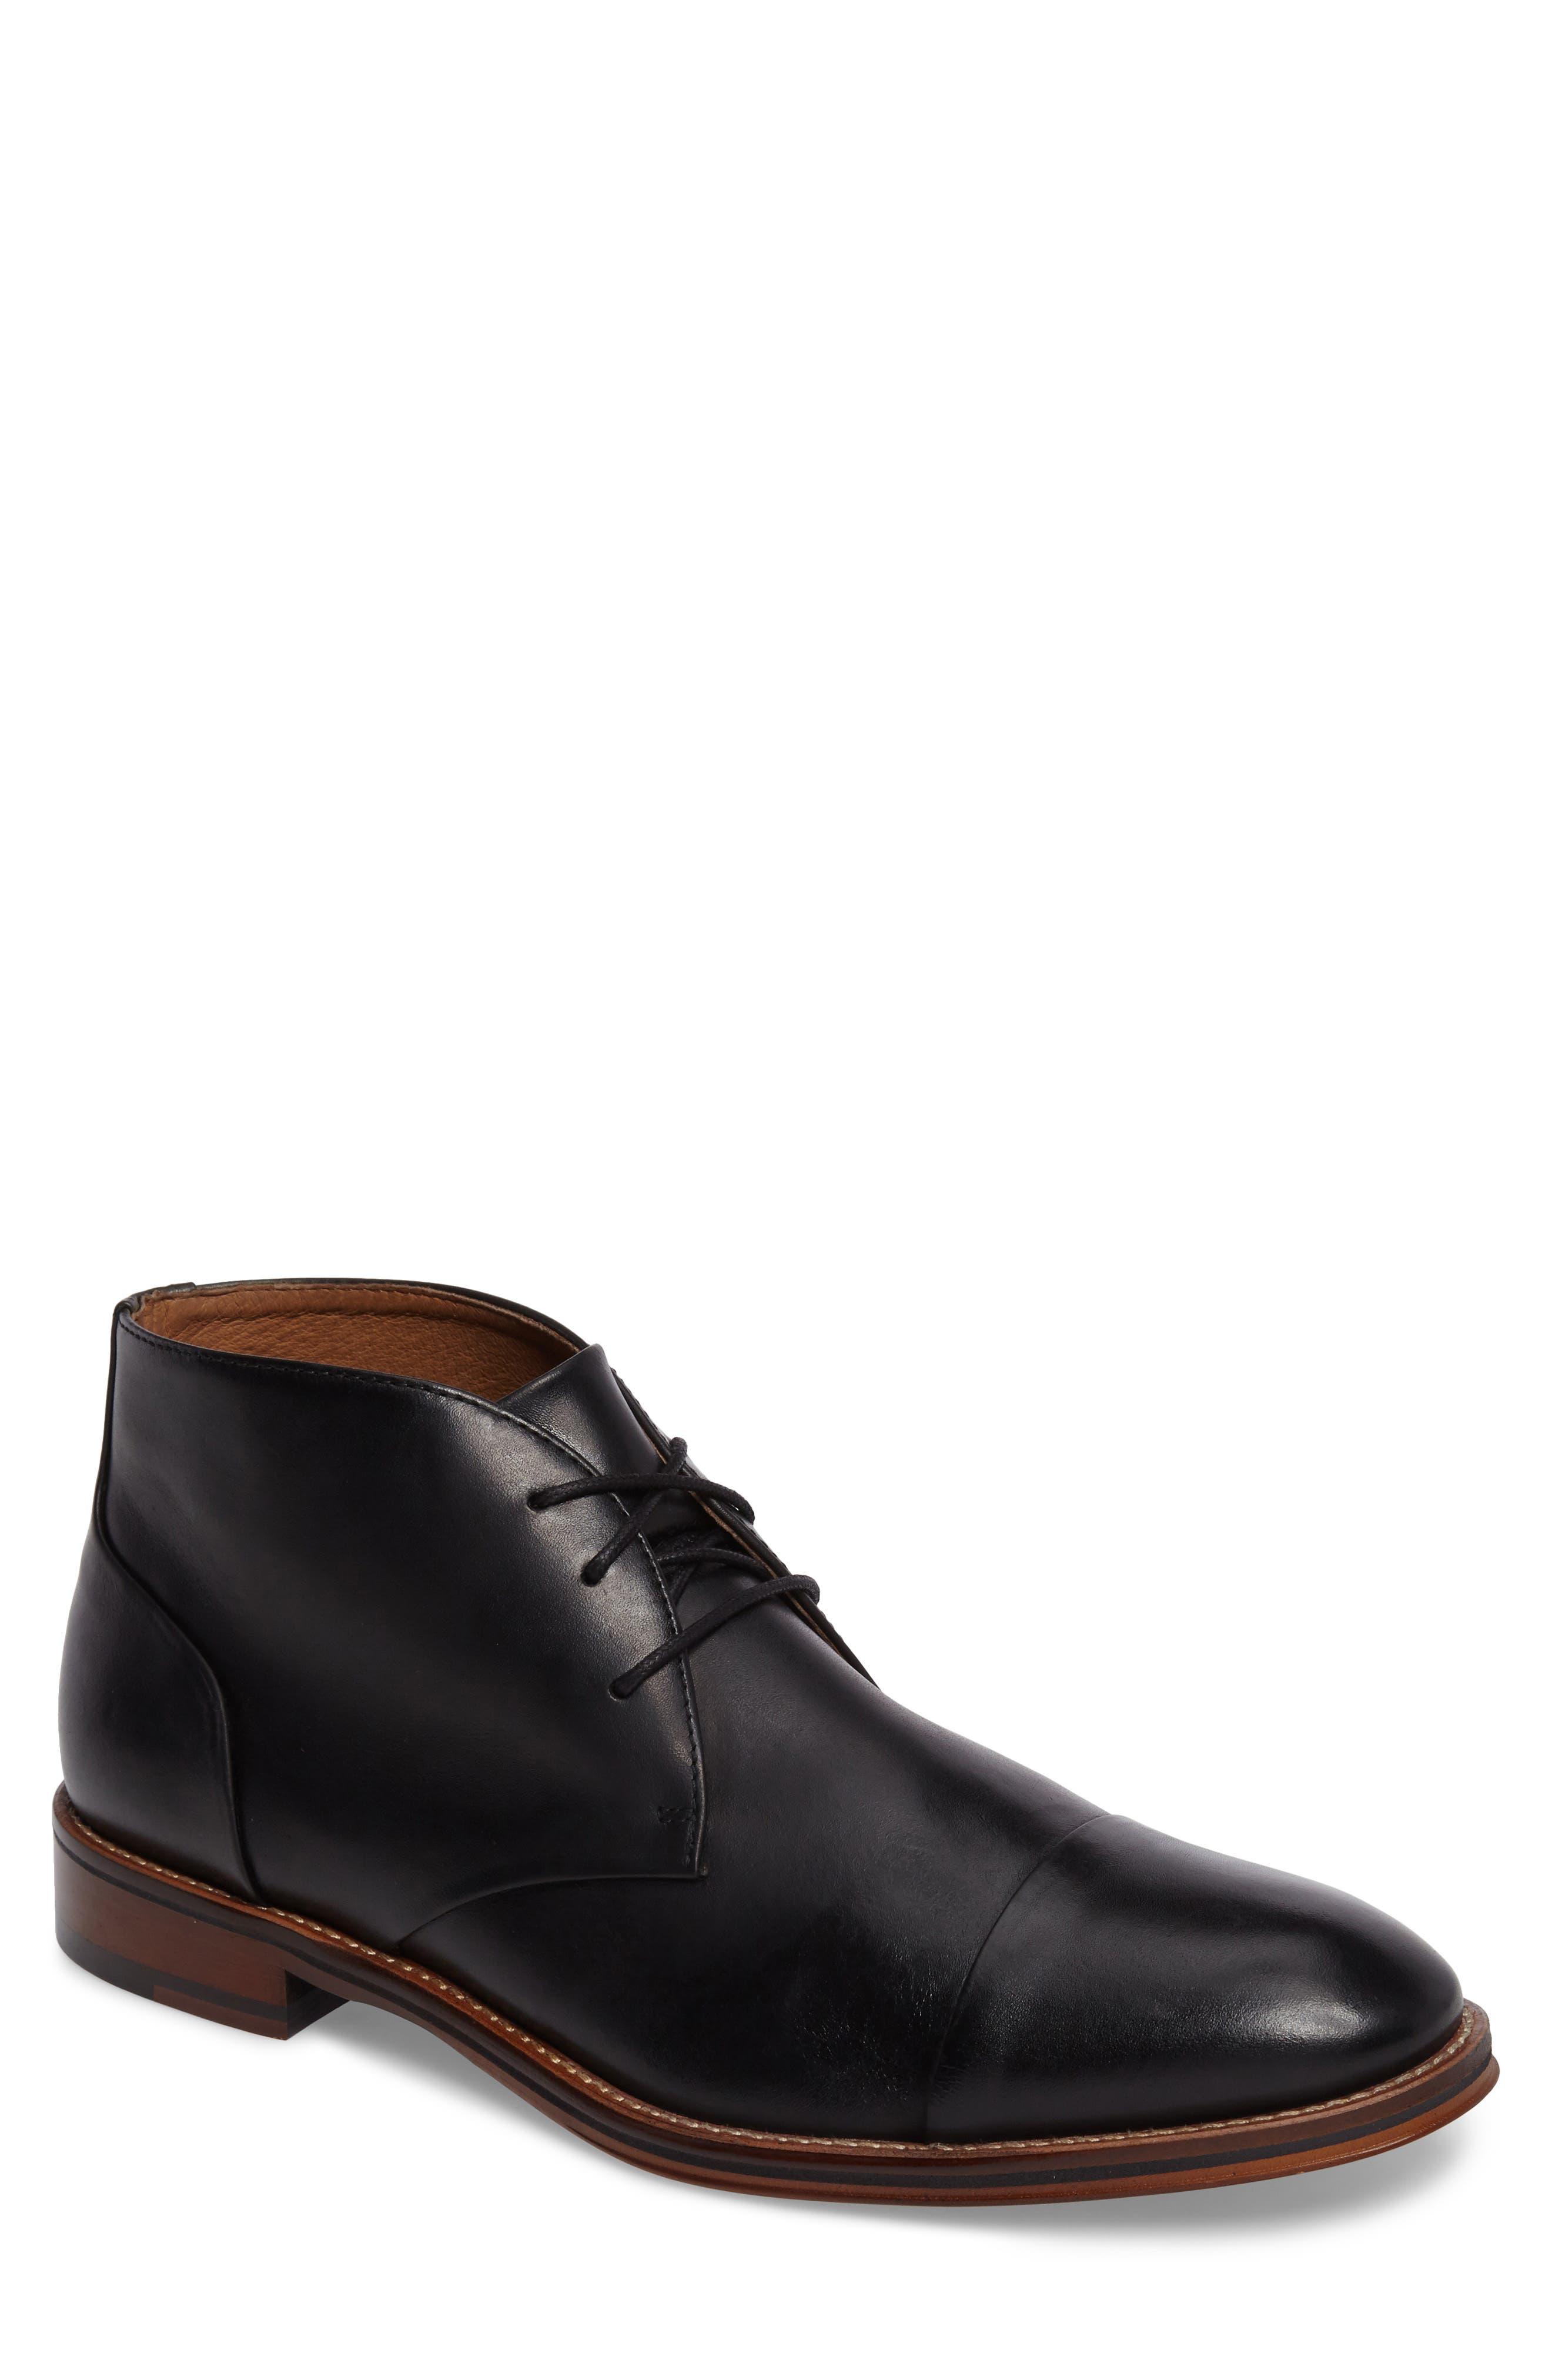 Conard Chukka Boot,                         Main,                         color, 001